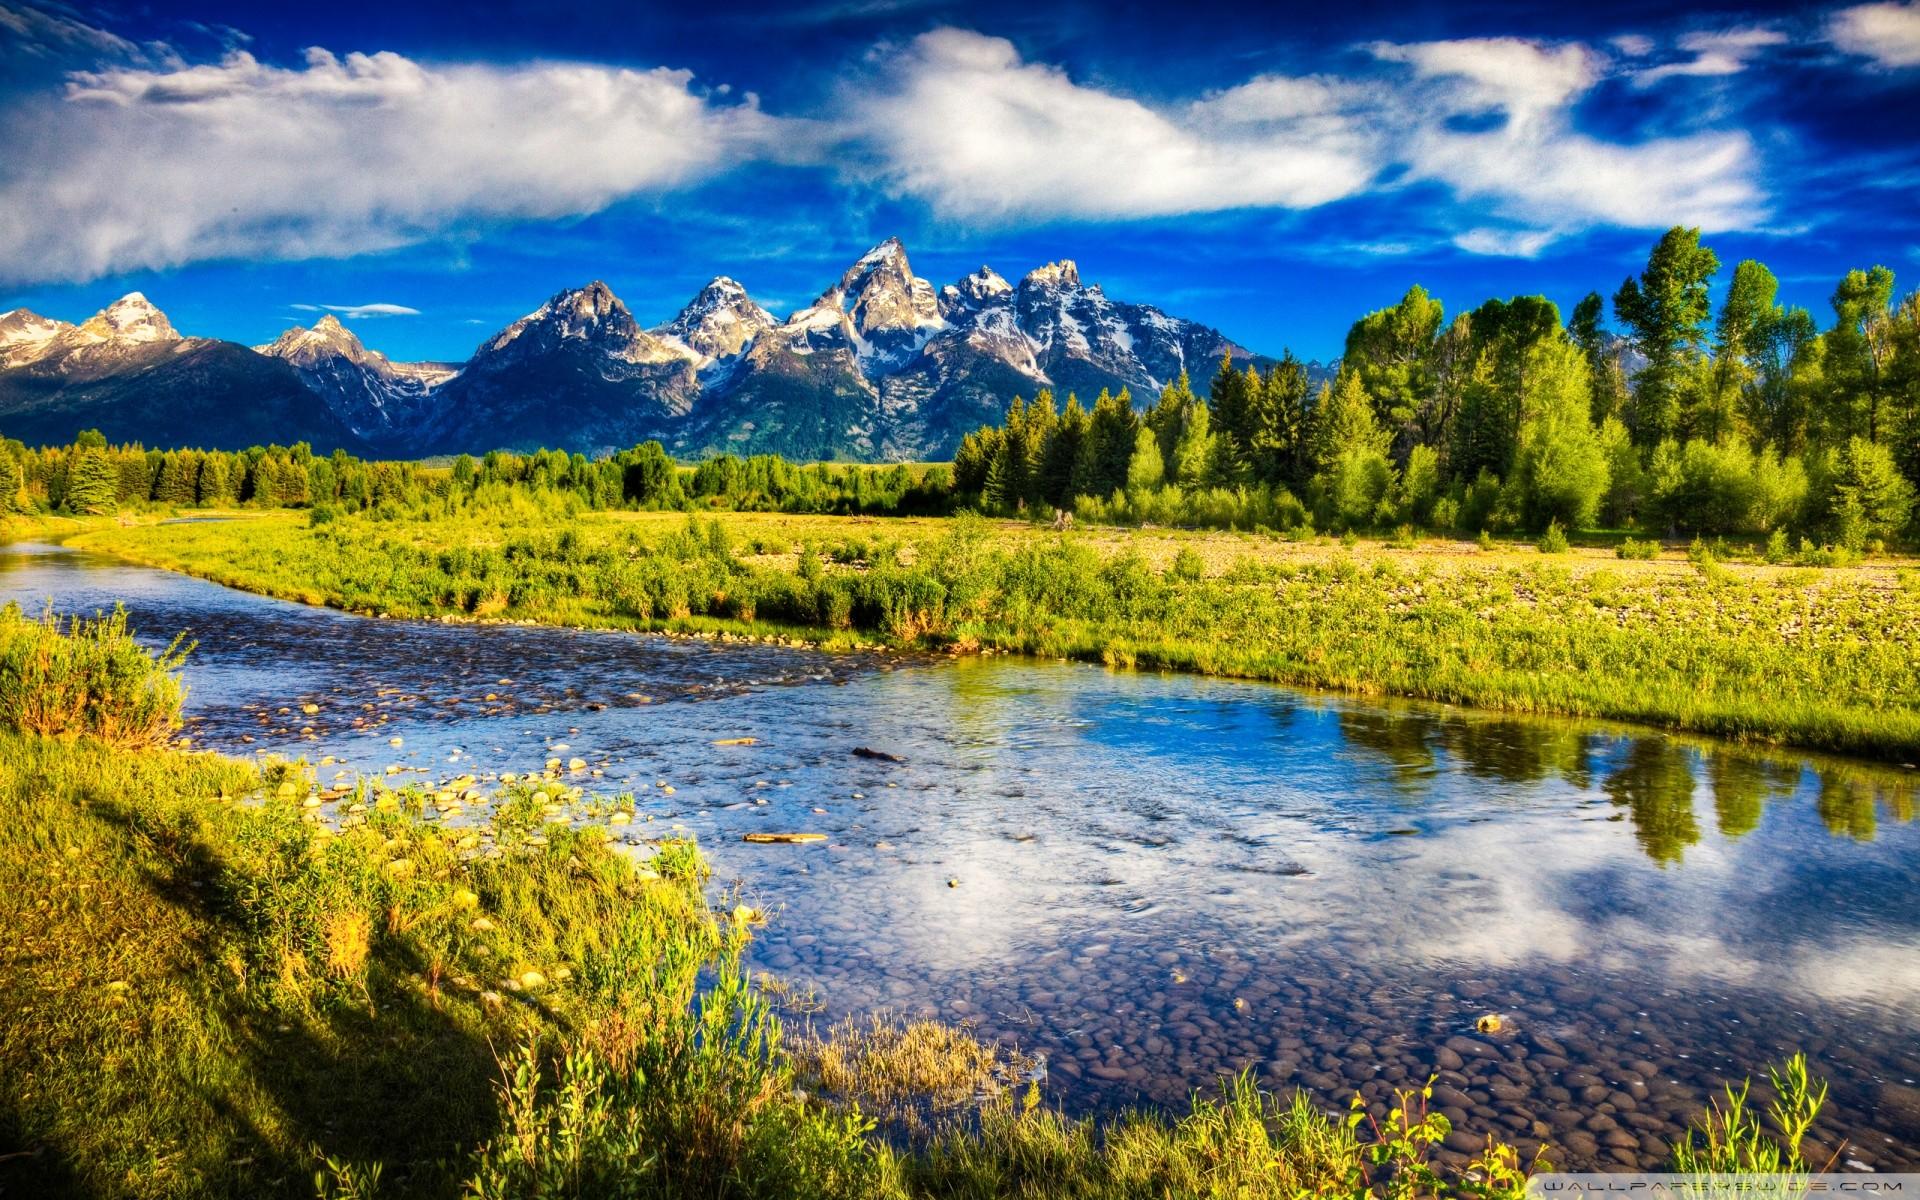 Beautiful Mountain Scenery Wallpaper Phone : Nature Wallpaper